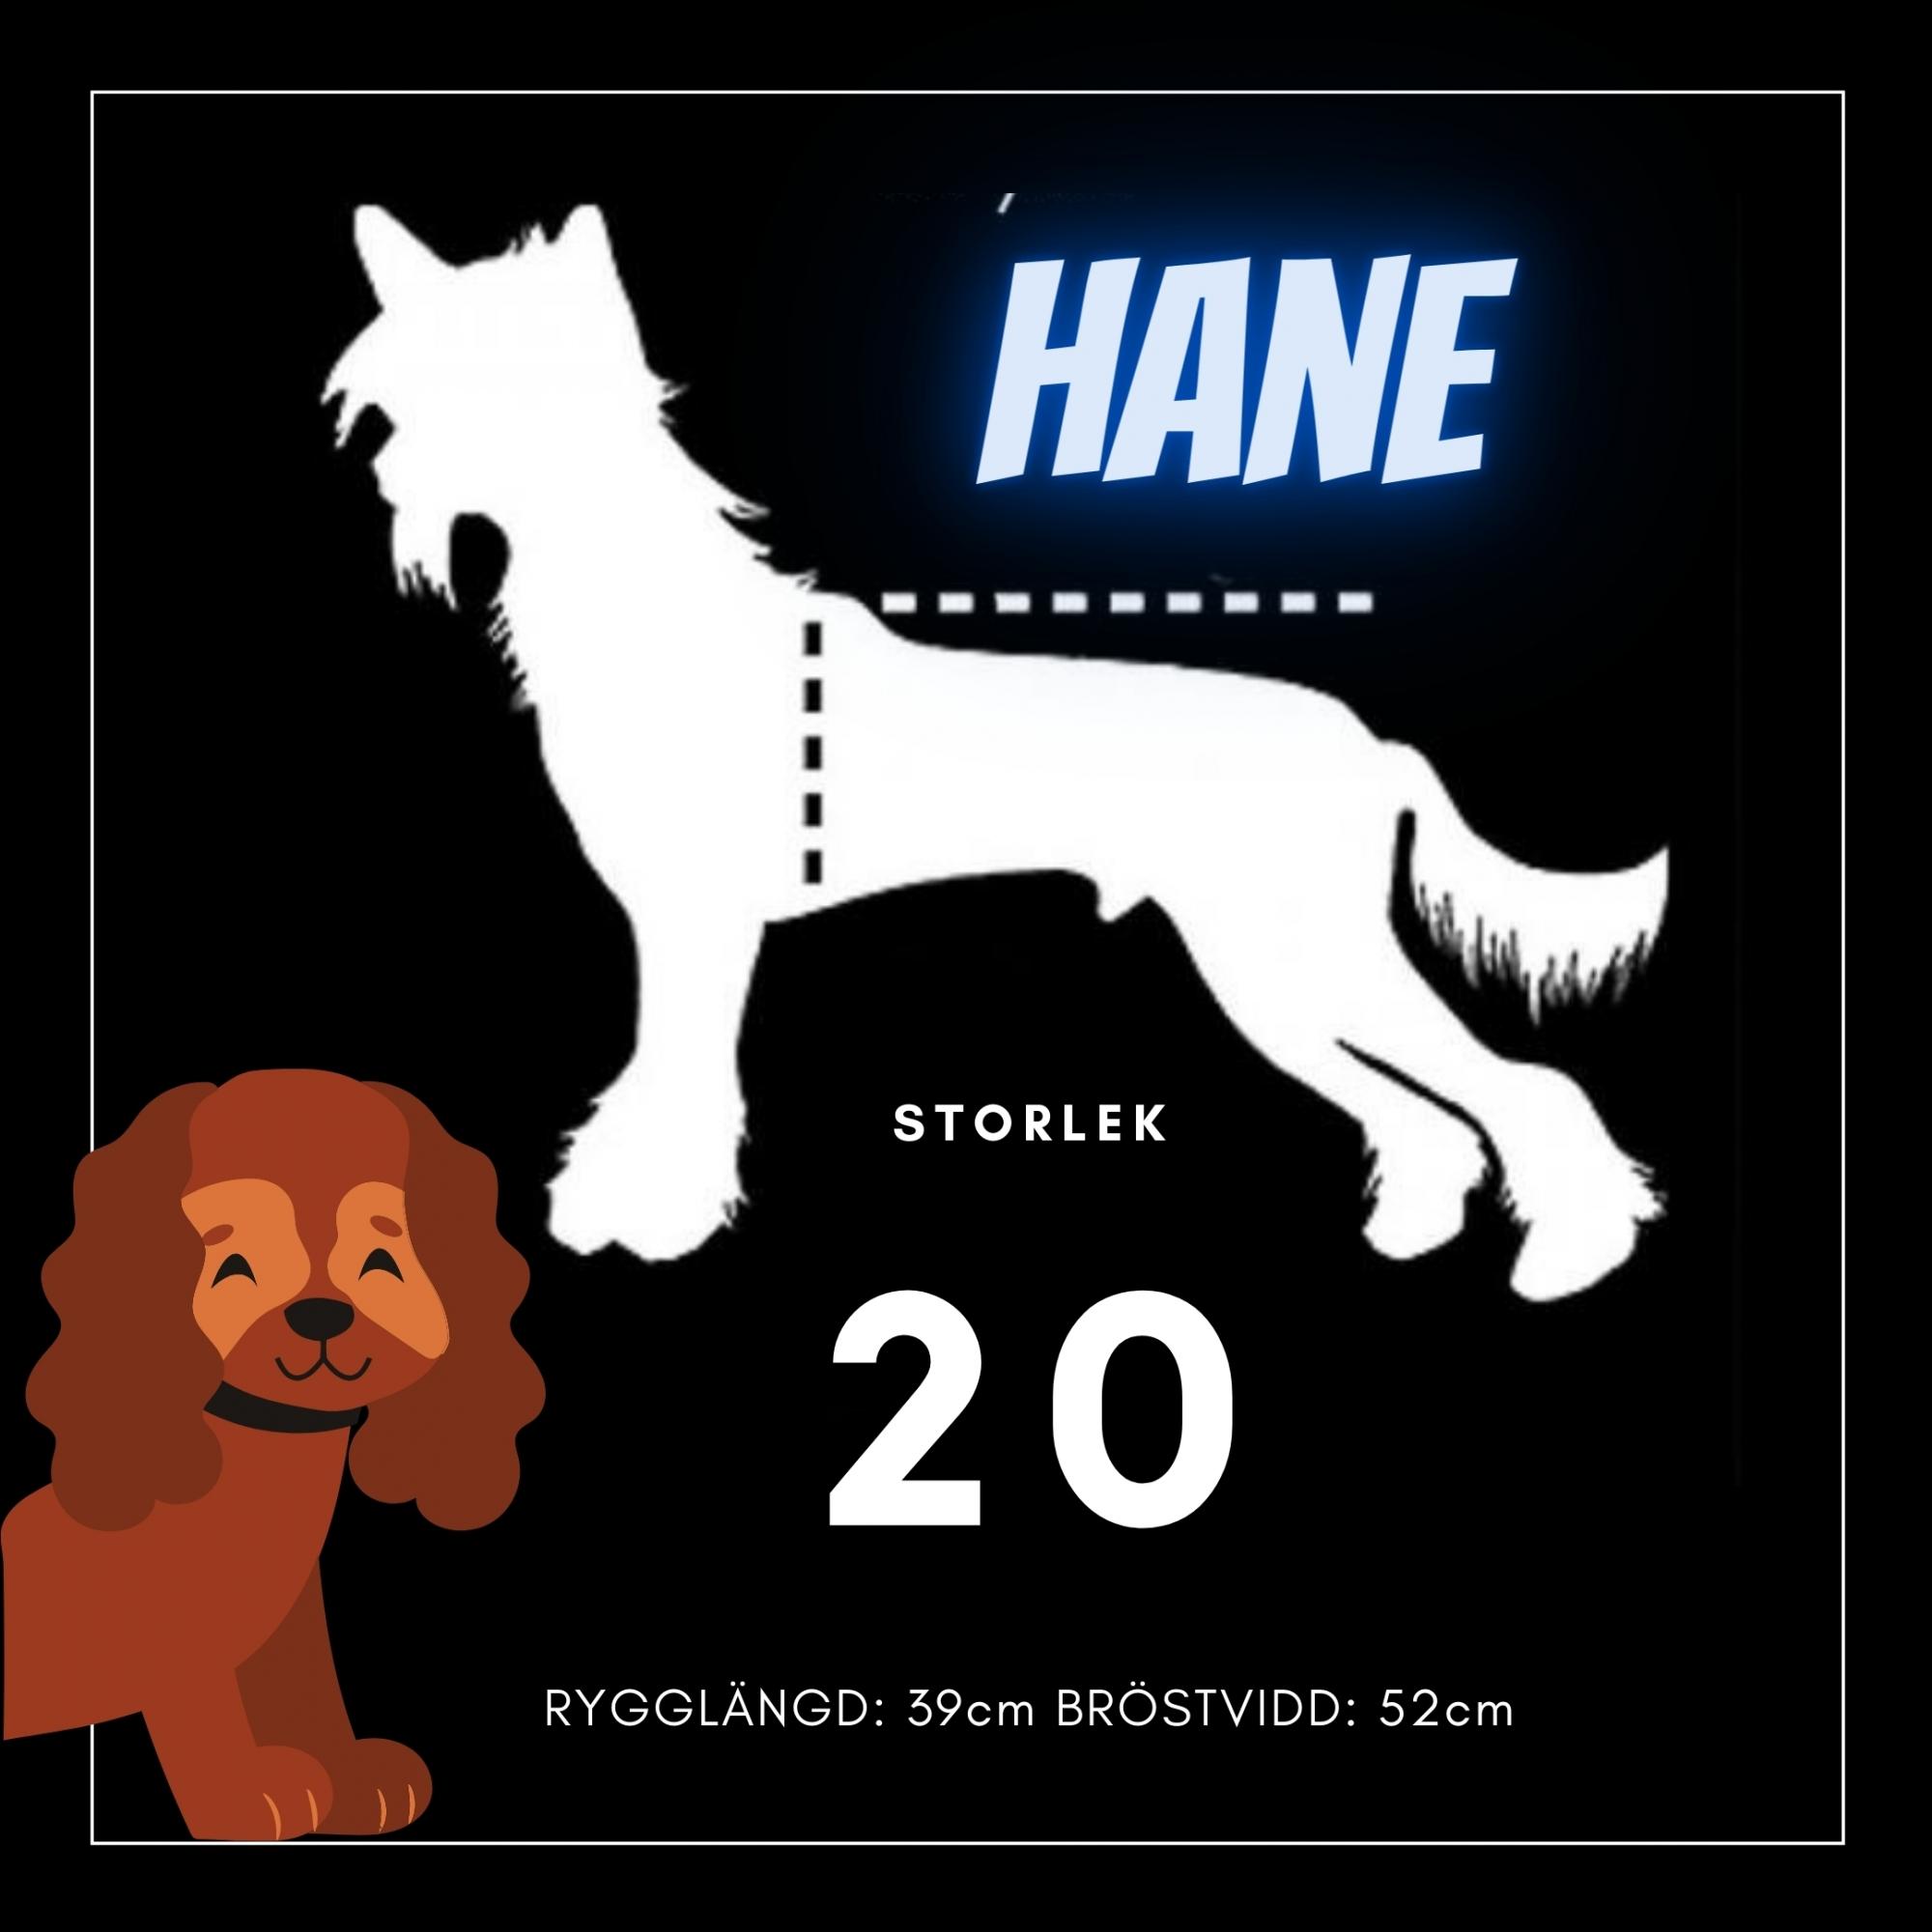 Hane Storlek 20 - Passion For Pet Fashion